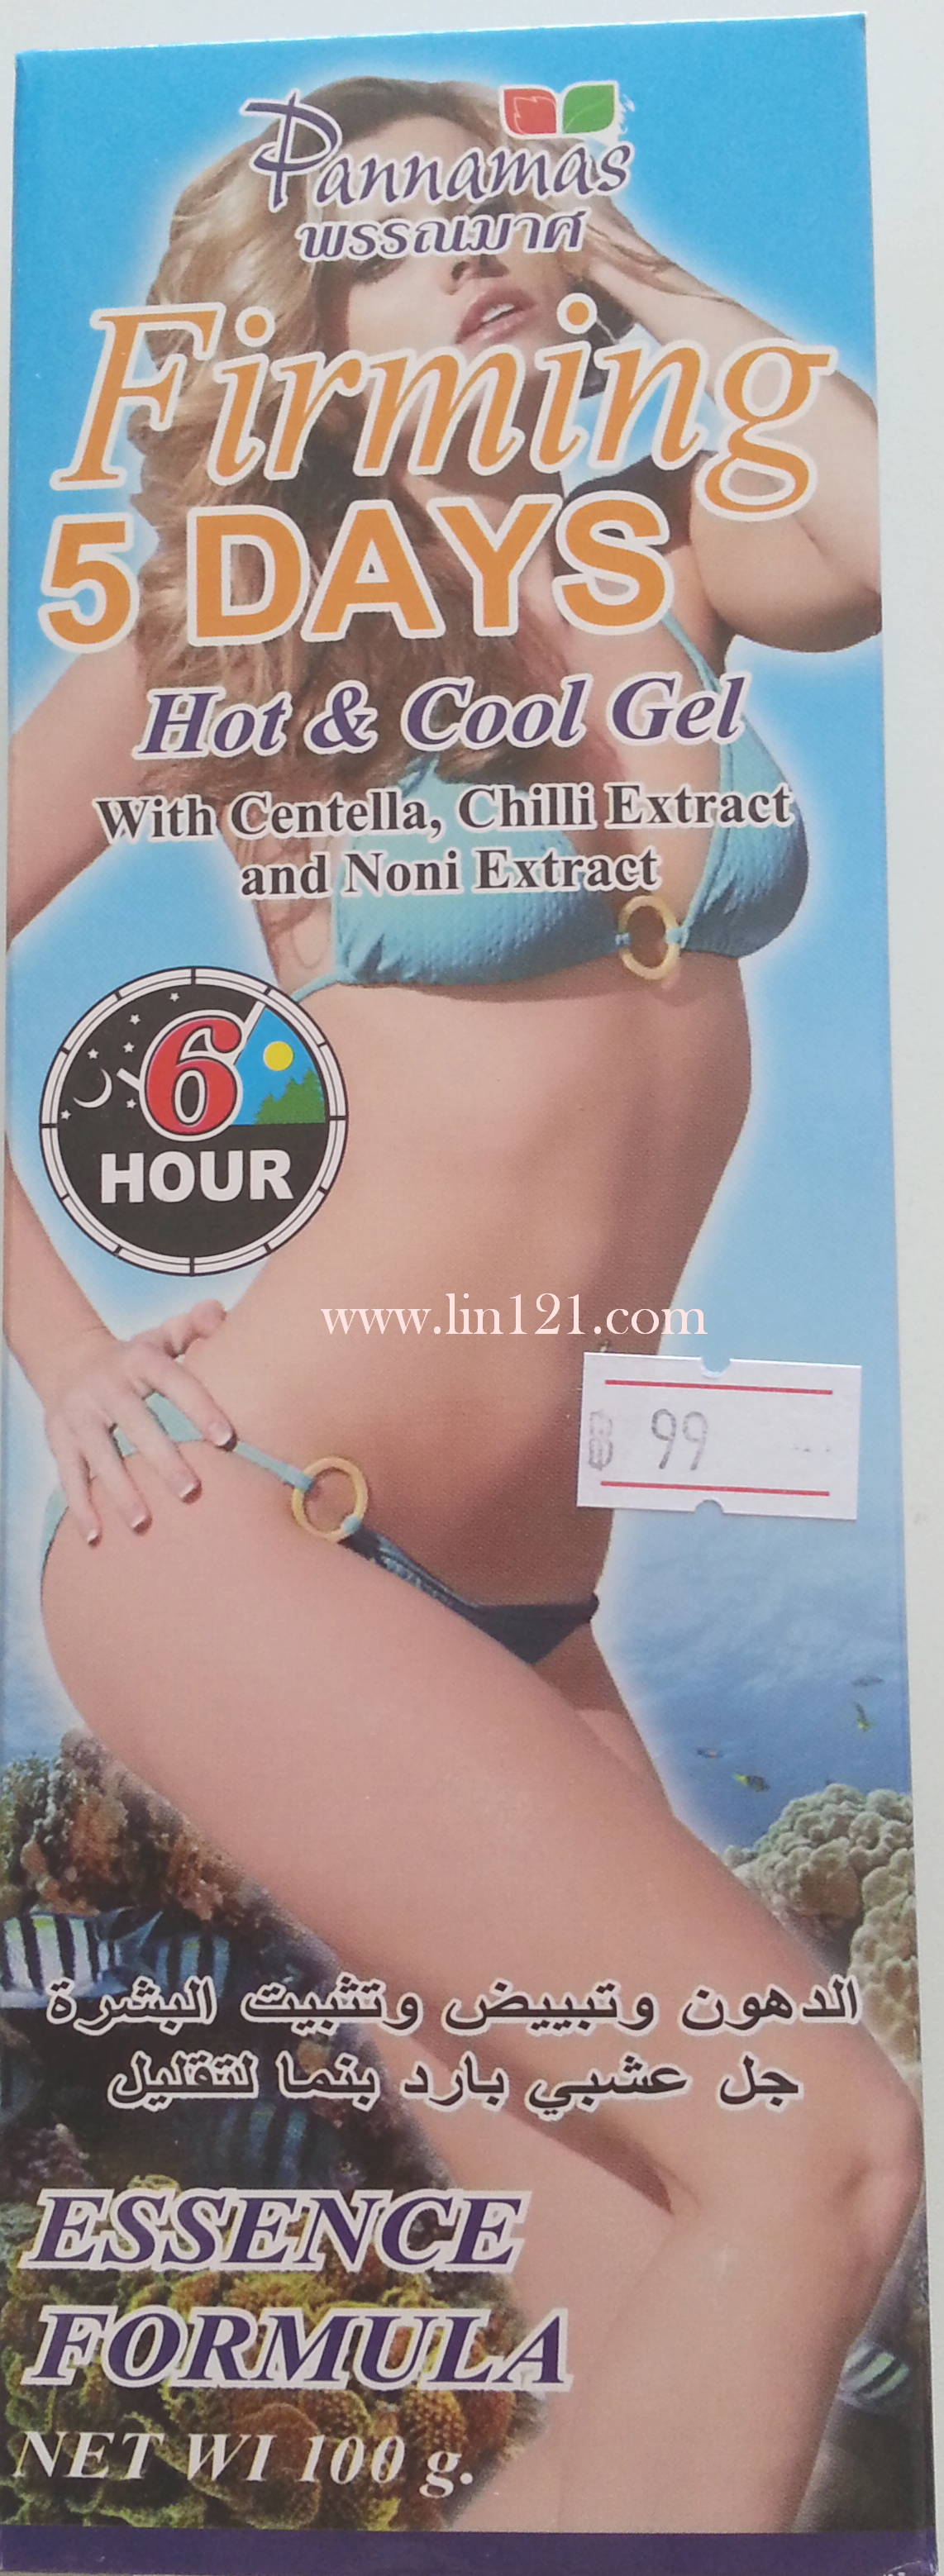 Pannamas Firming 5 Days Hot & Cool Gel with Gentella Chilli & Noni Extract(เจลยกระชับผิว พรรณมาศ) 100 กรัม